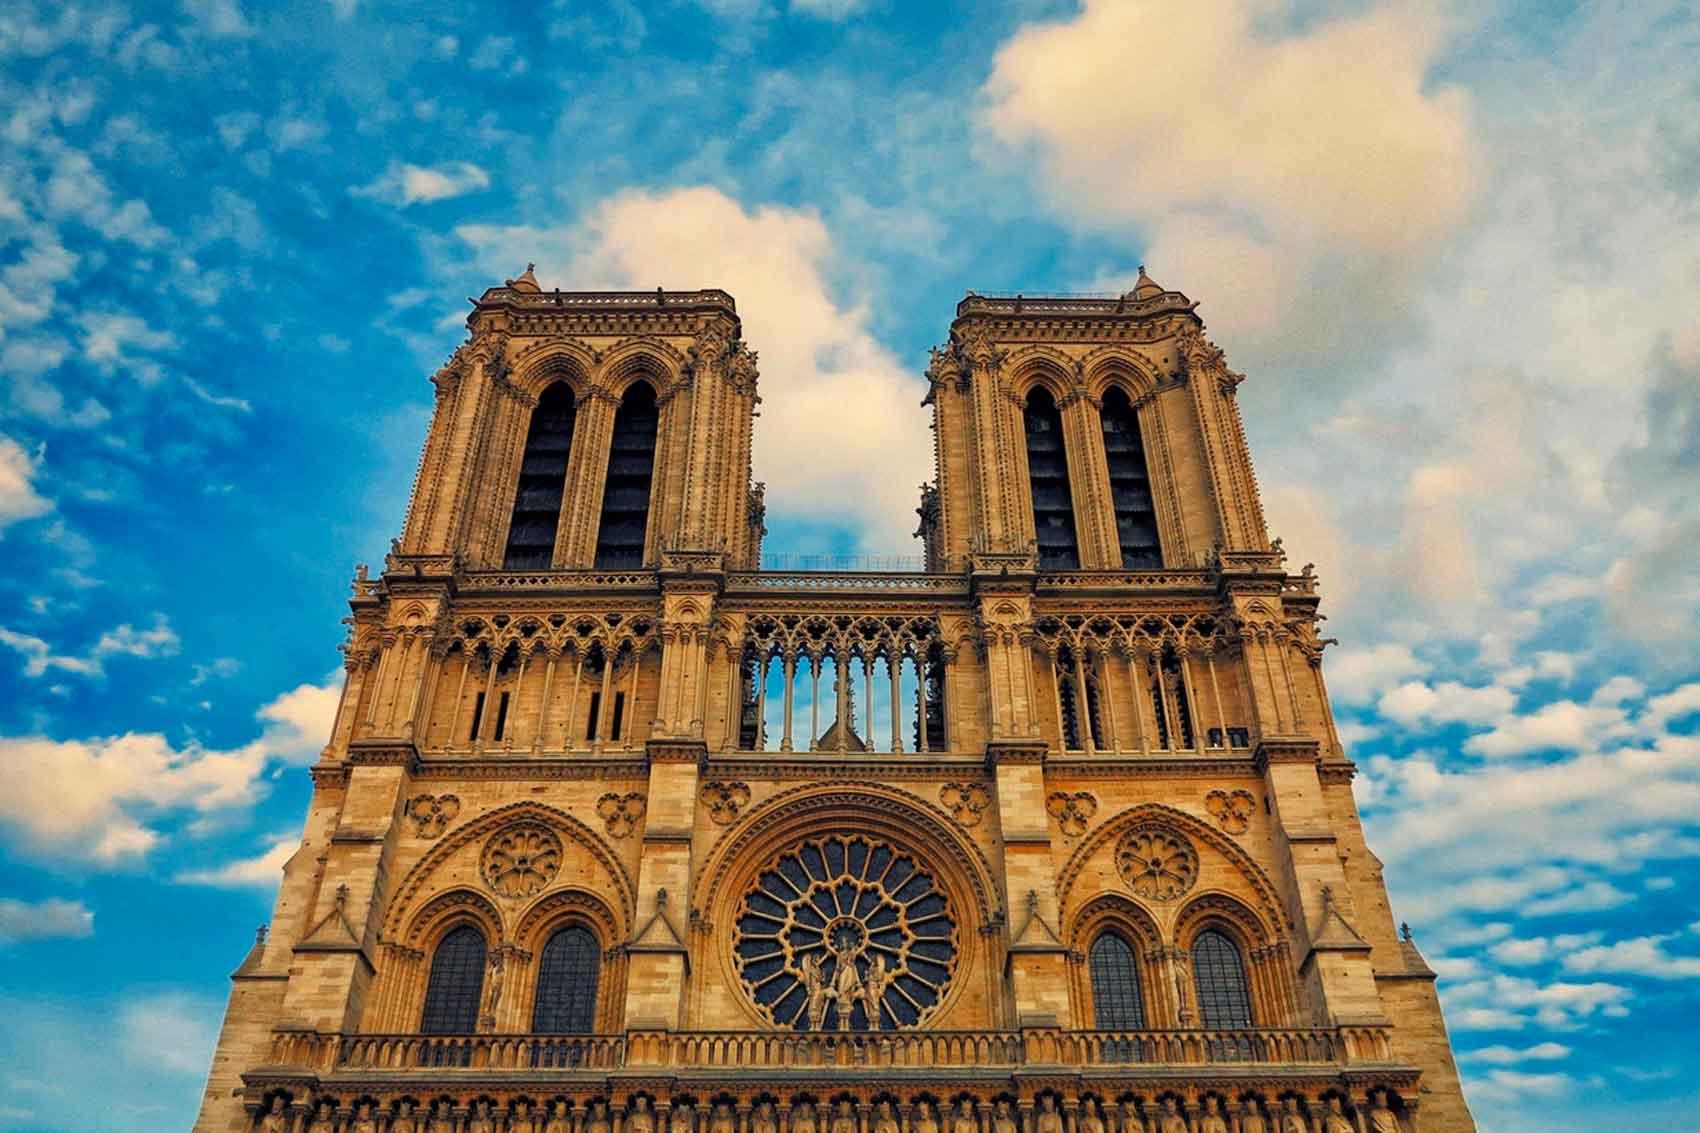 Notre-Dame de Paris: An International Emotional Uproar that Absurdly Makes No Sense